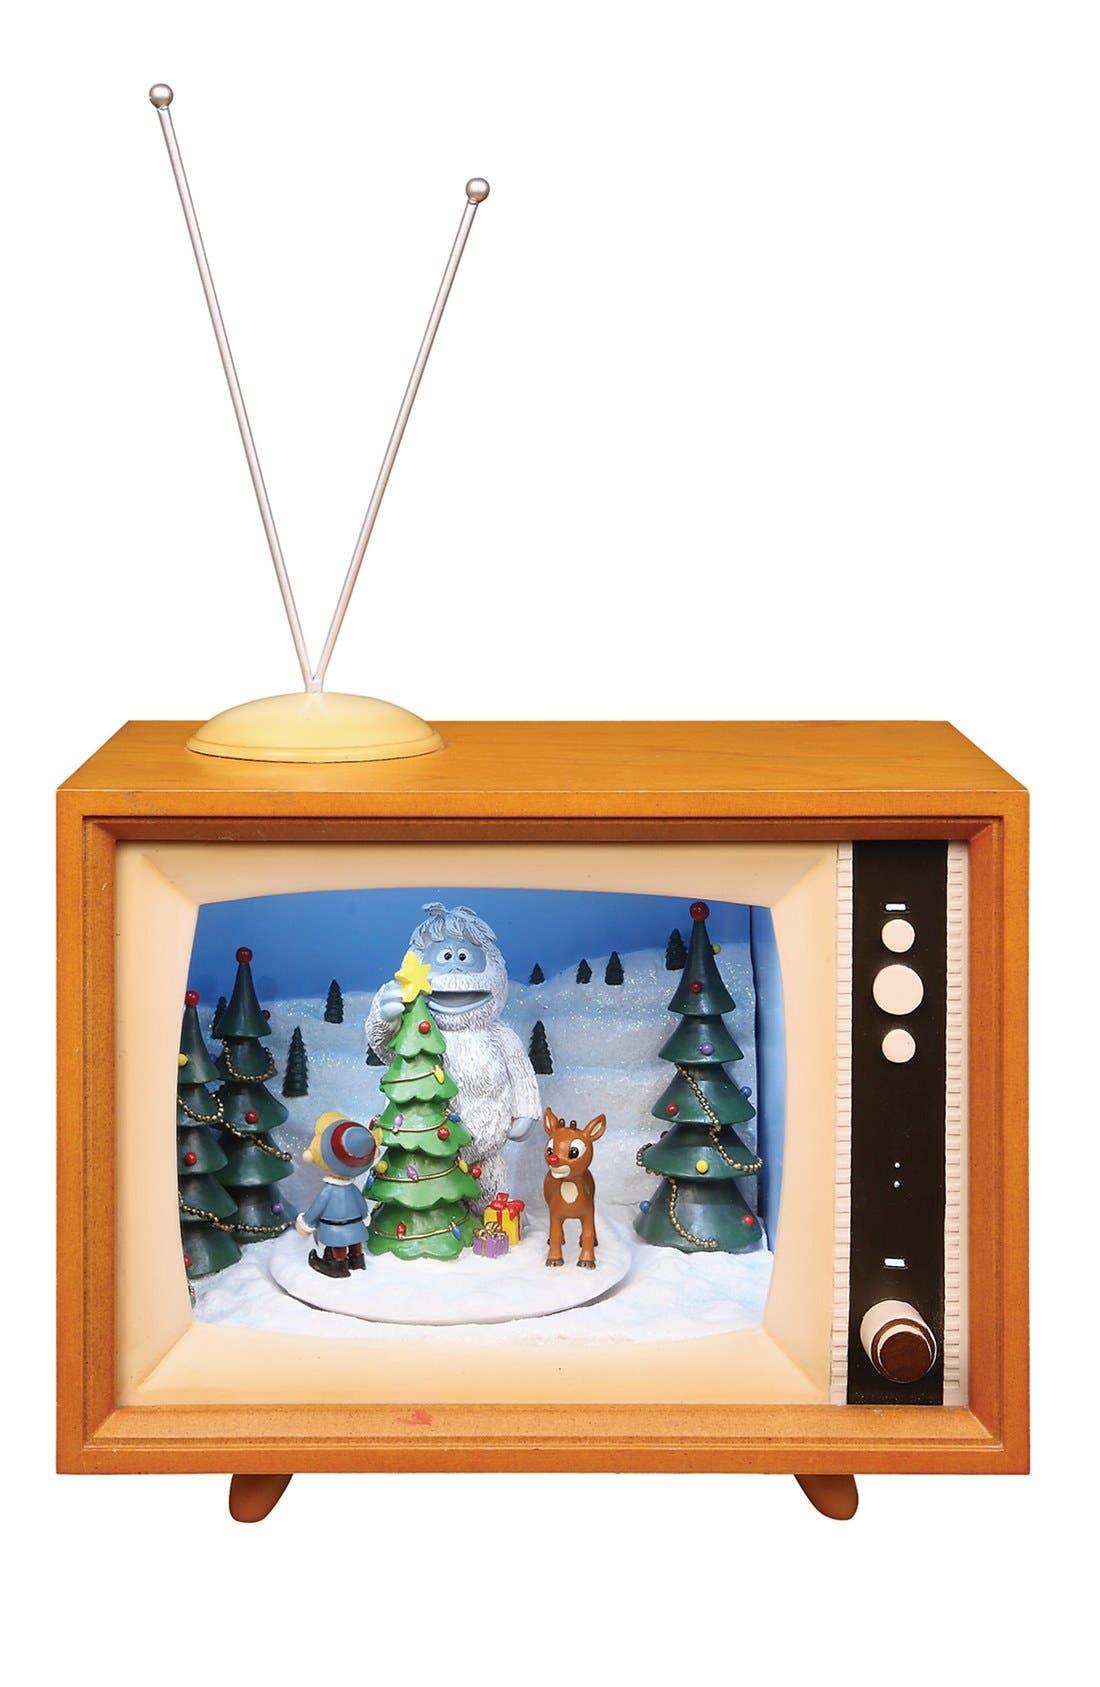 'Rudolph' Musical TV Decoration,                             Main thumbnail 1, color,                             200